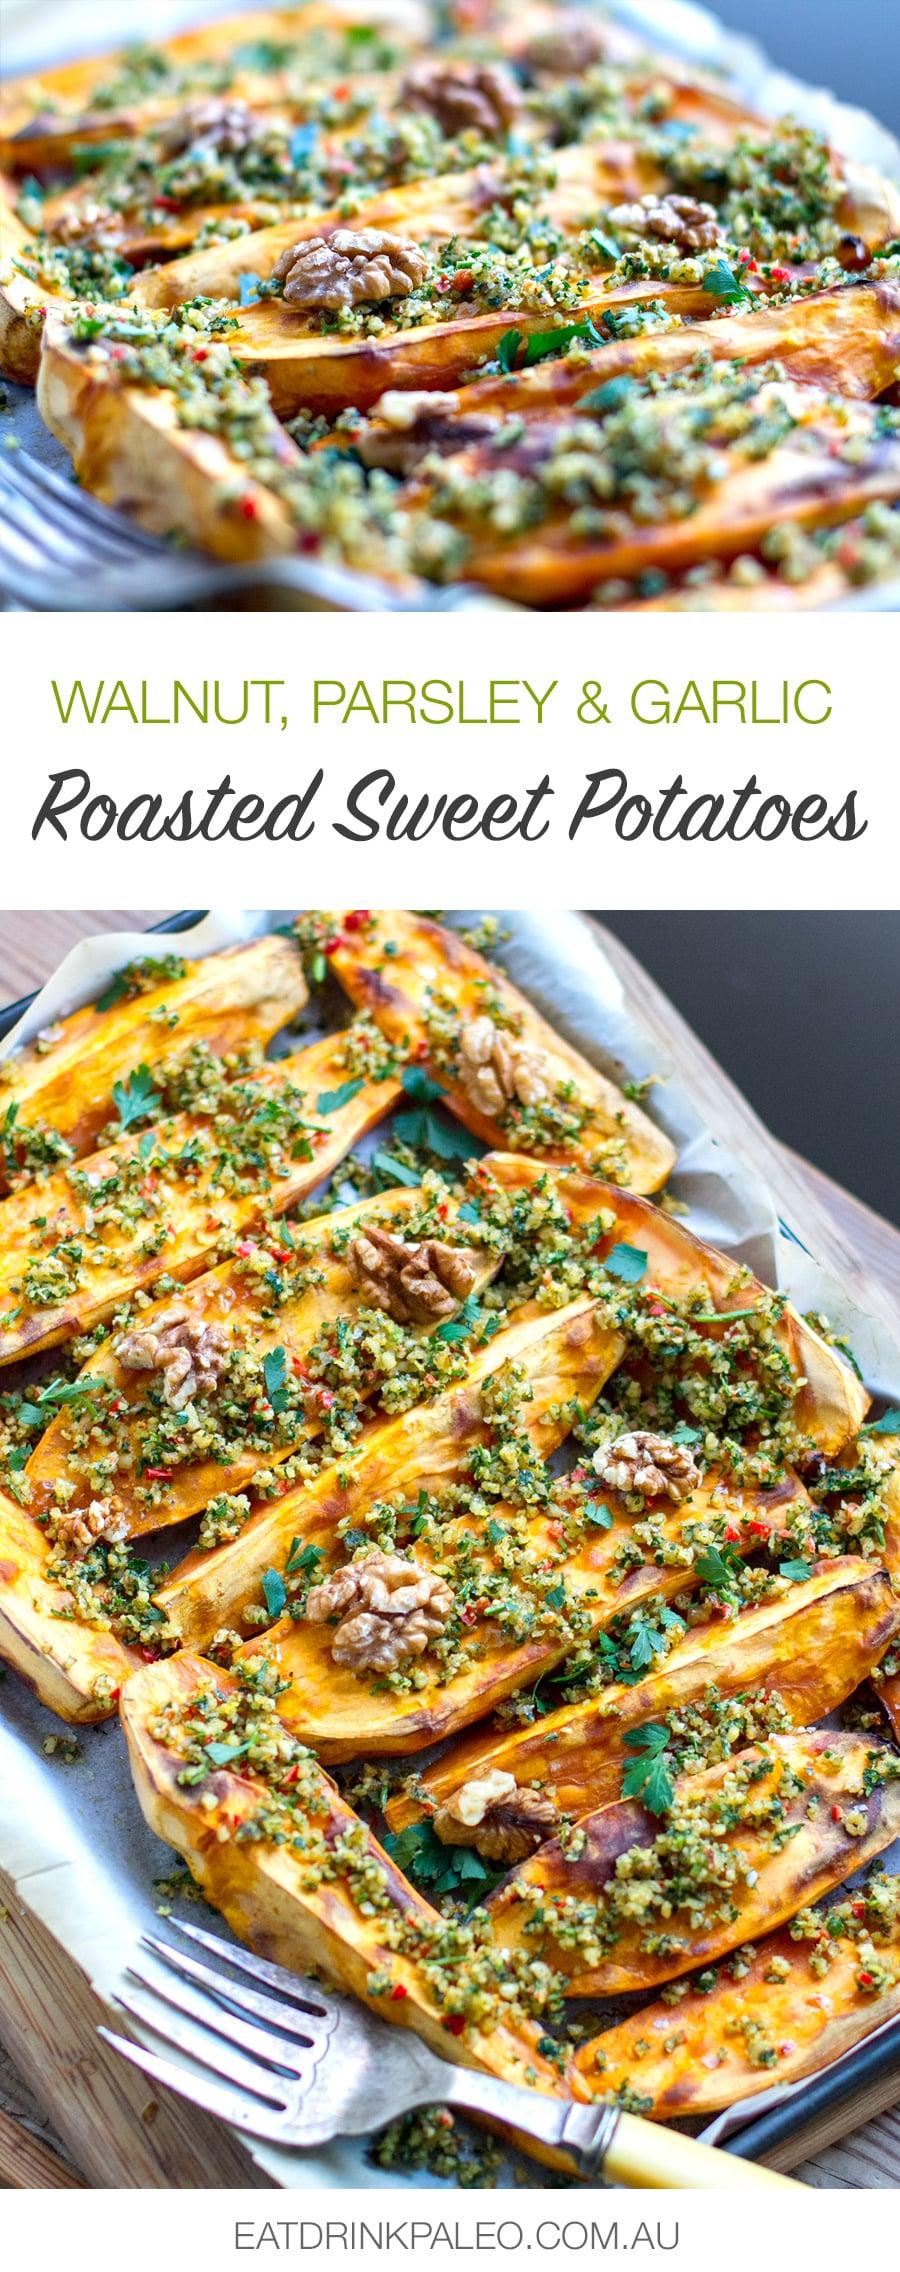 Walnuts, Parsley & Garlic Roasted Sweet Potatoes